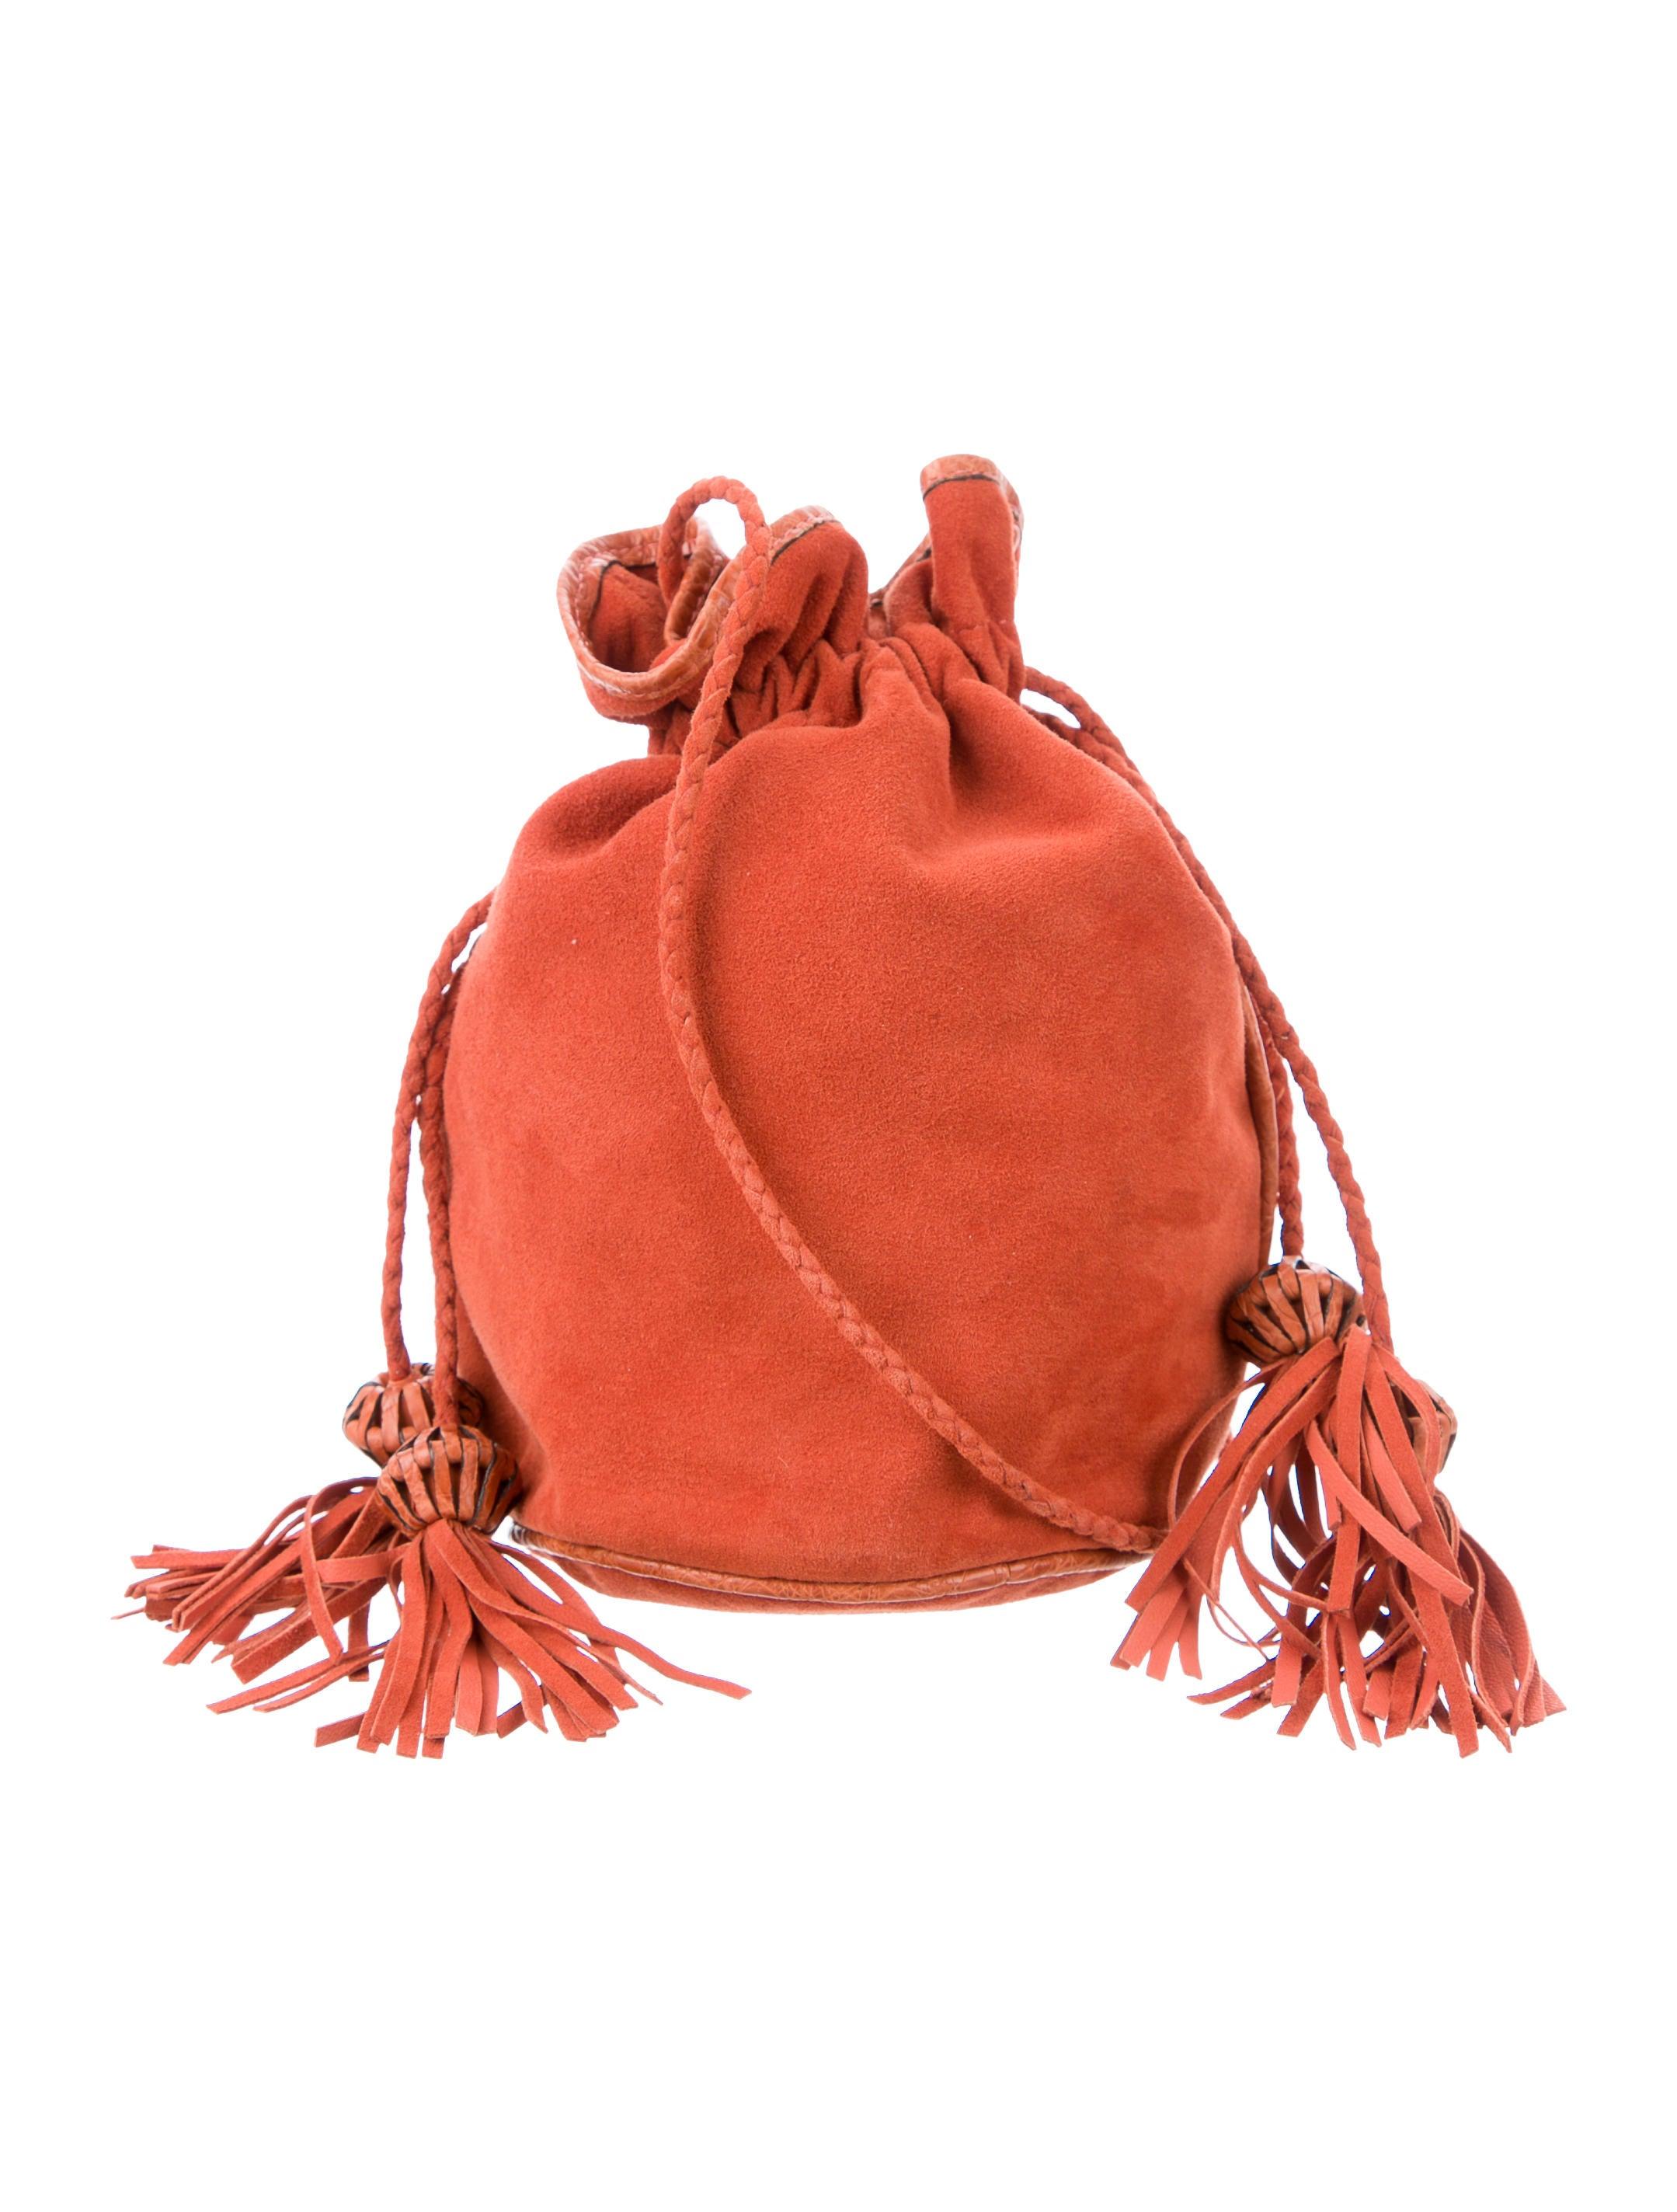 Suede Crocodile Small Drawstring Bag